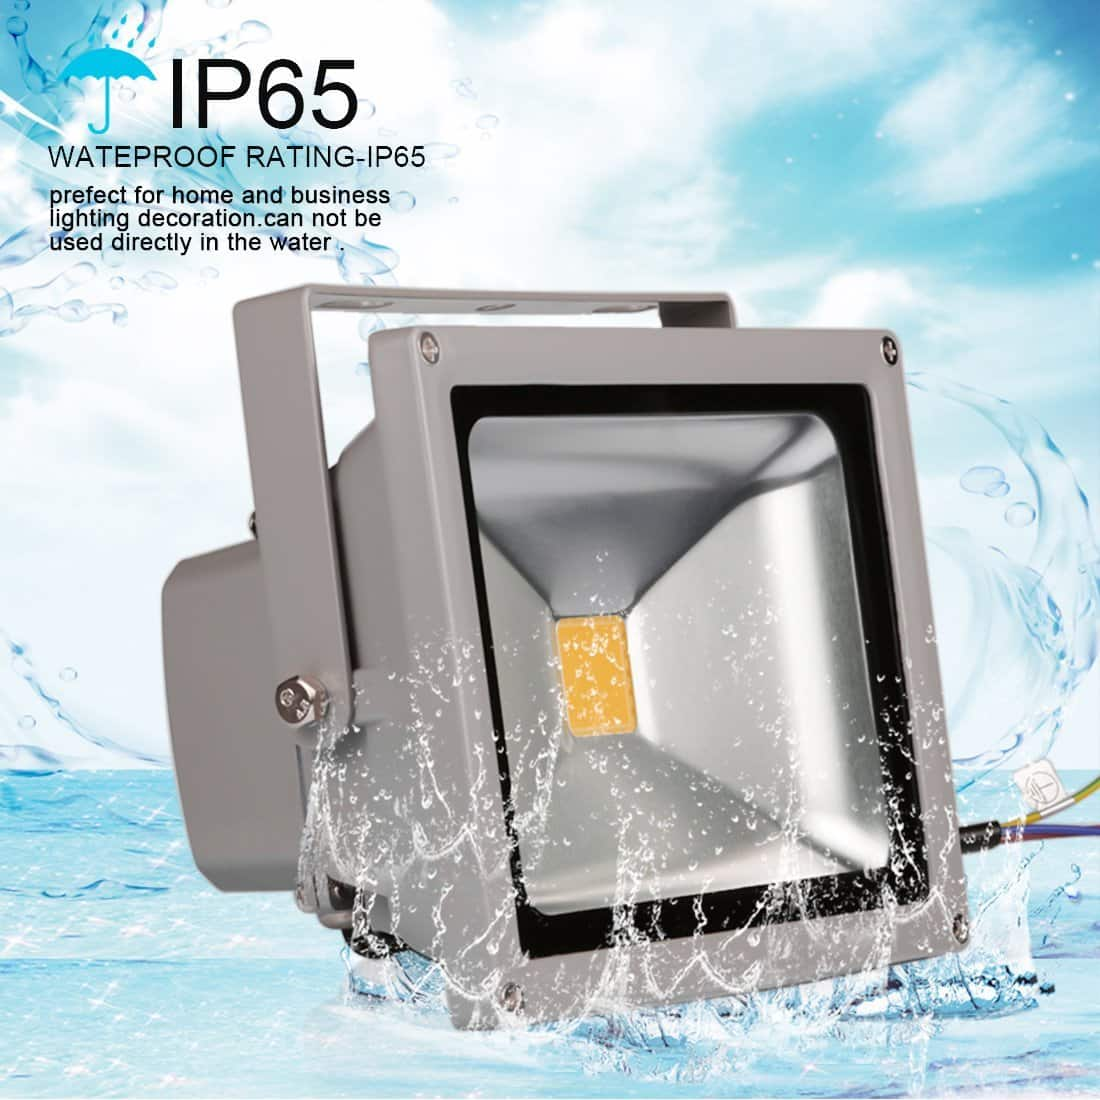 20W/50W/100W Waterproof IP65 LED Flood Light Halogen Equivalent 40% OFF @$12.59 @Amazon